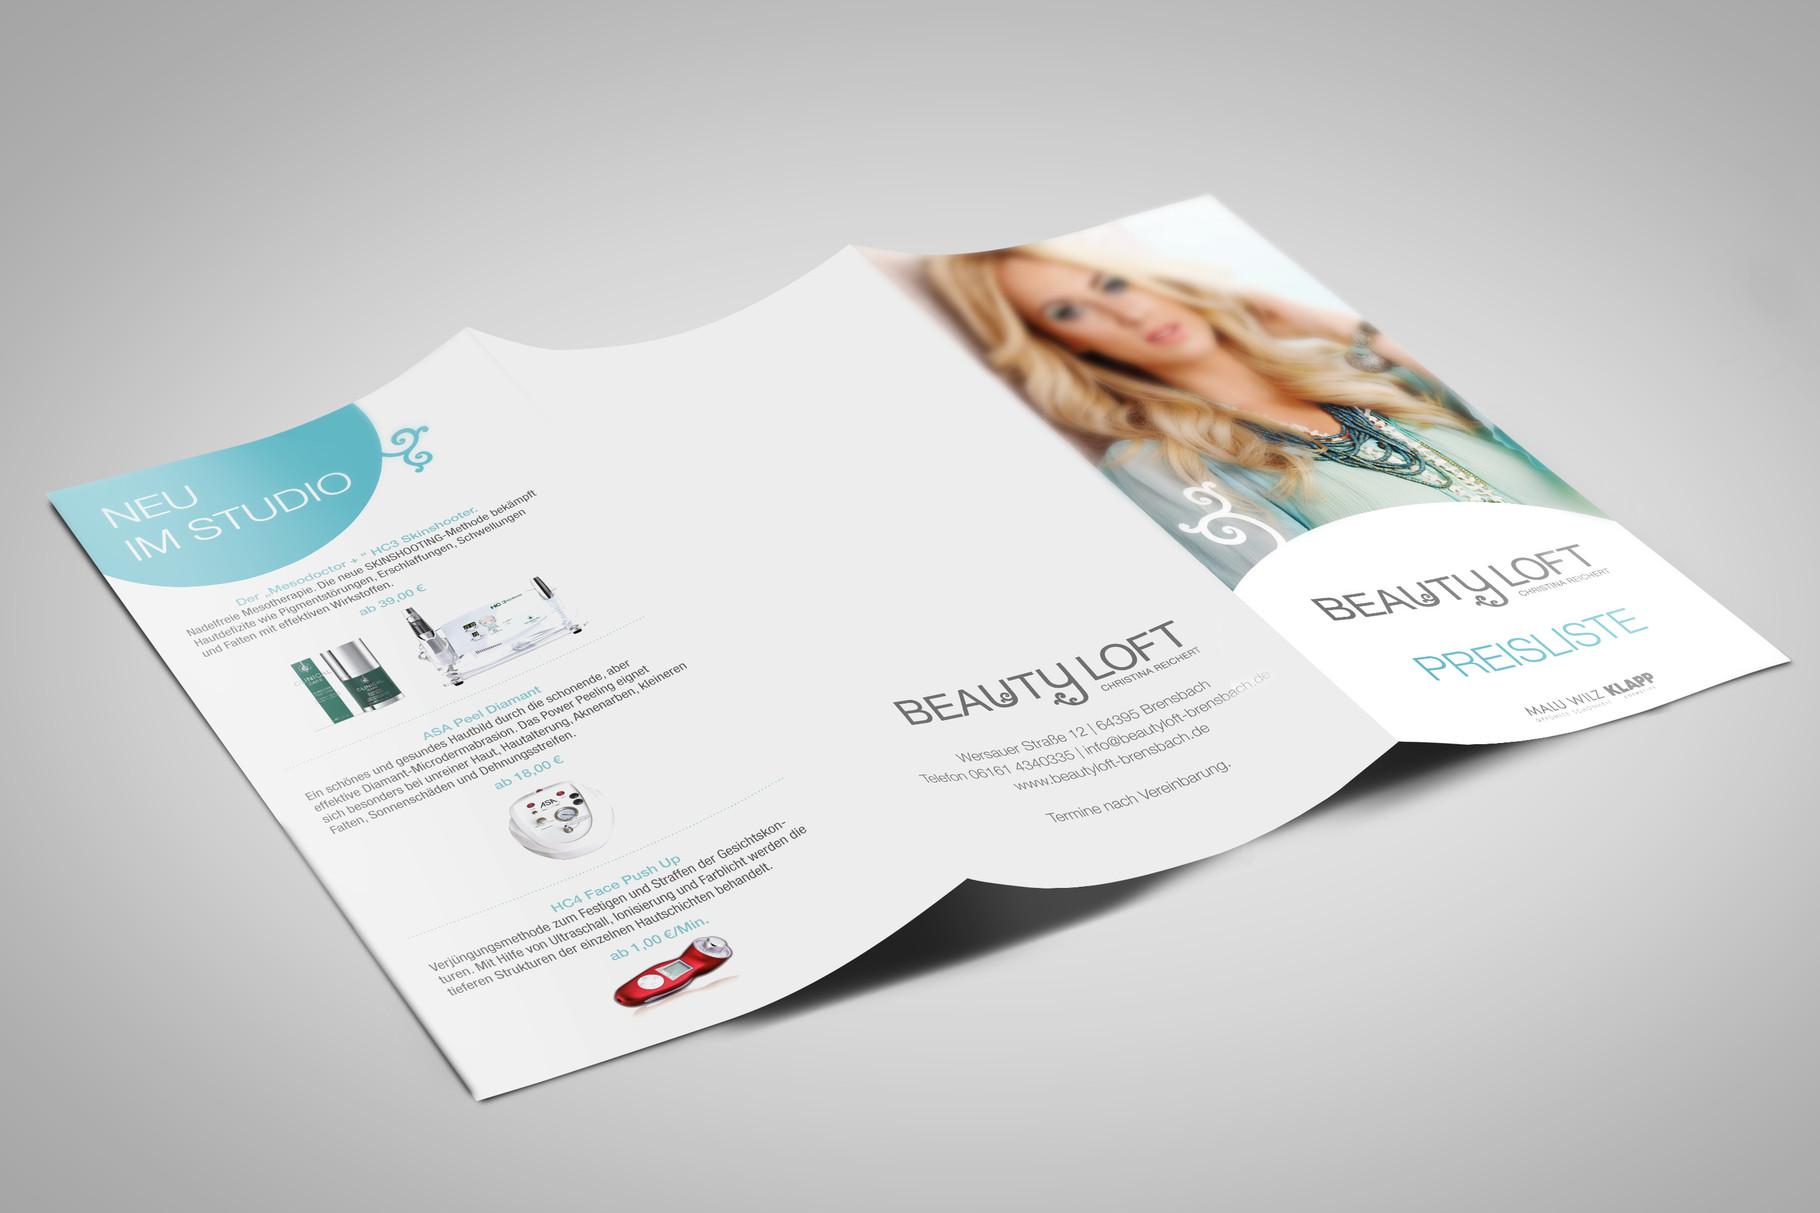 Corporate Design, Logoentwicklung, Logo, Grafikdesign, Grafik, Gestaltung, Beautyloft Preisliste Sommer